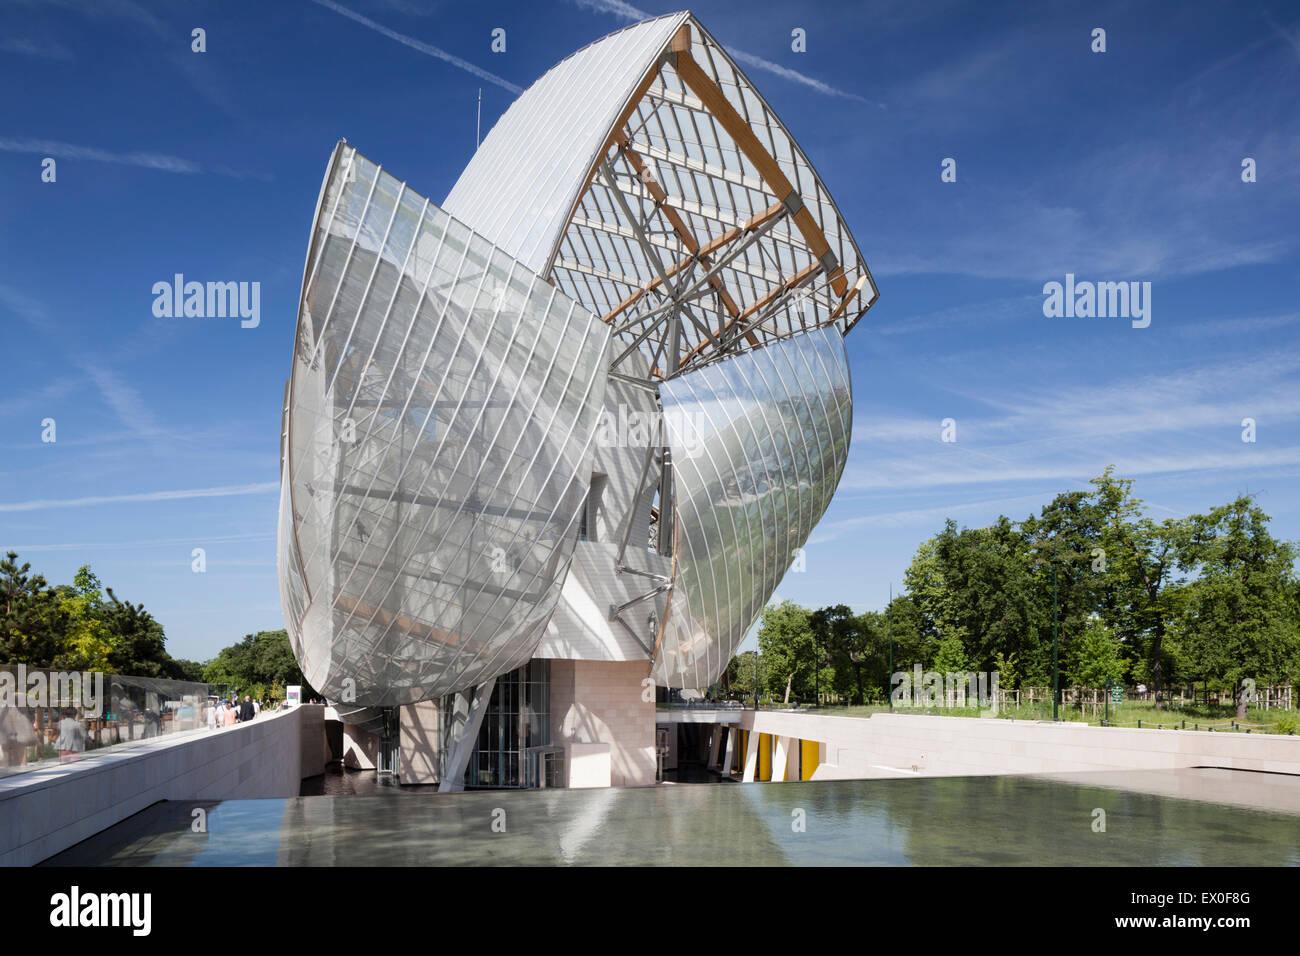 Fondation Louis Vuitton, Bois de Boulogne, Paris, France. East facade view of a water feature in front of the sail - Stock Image